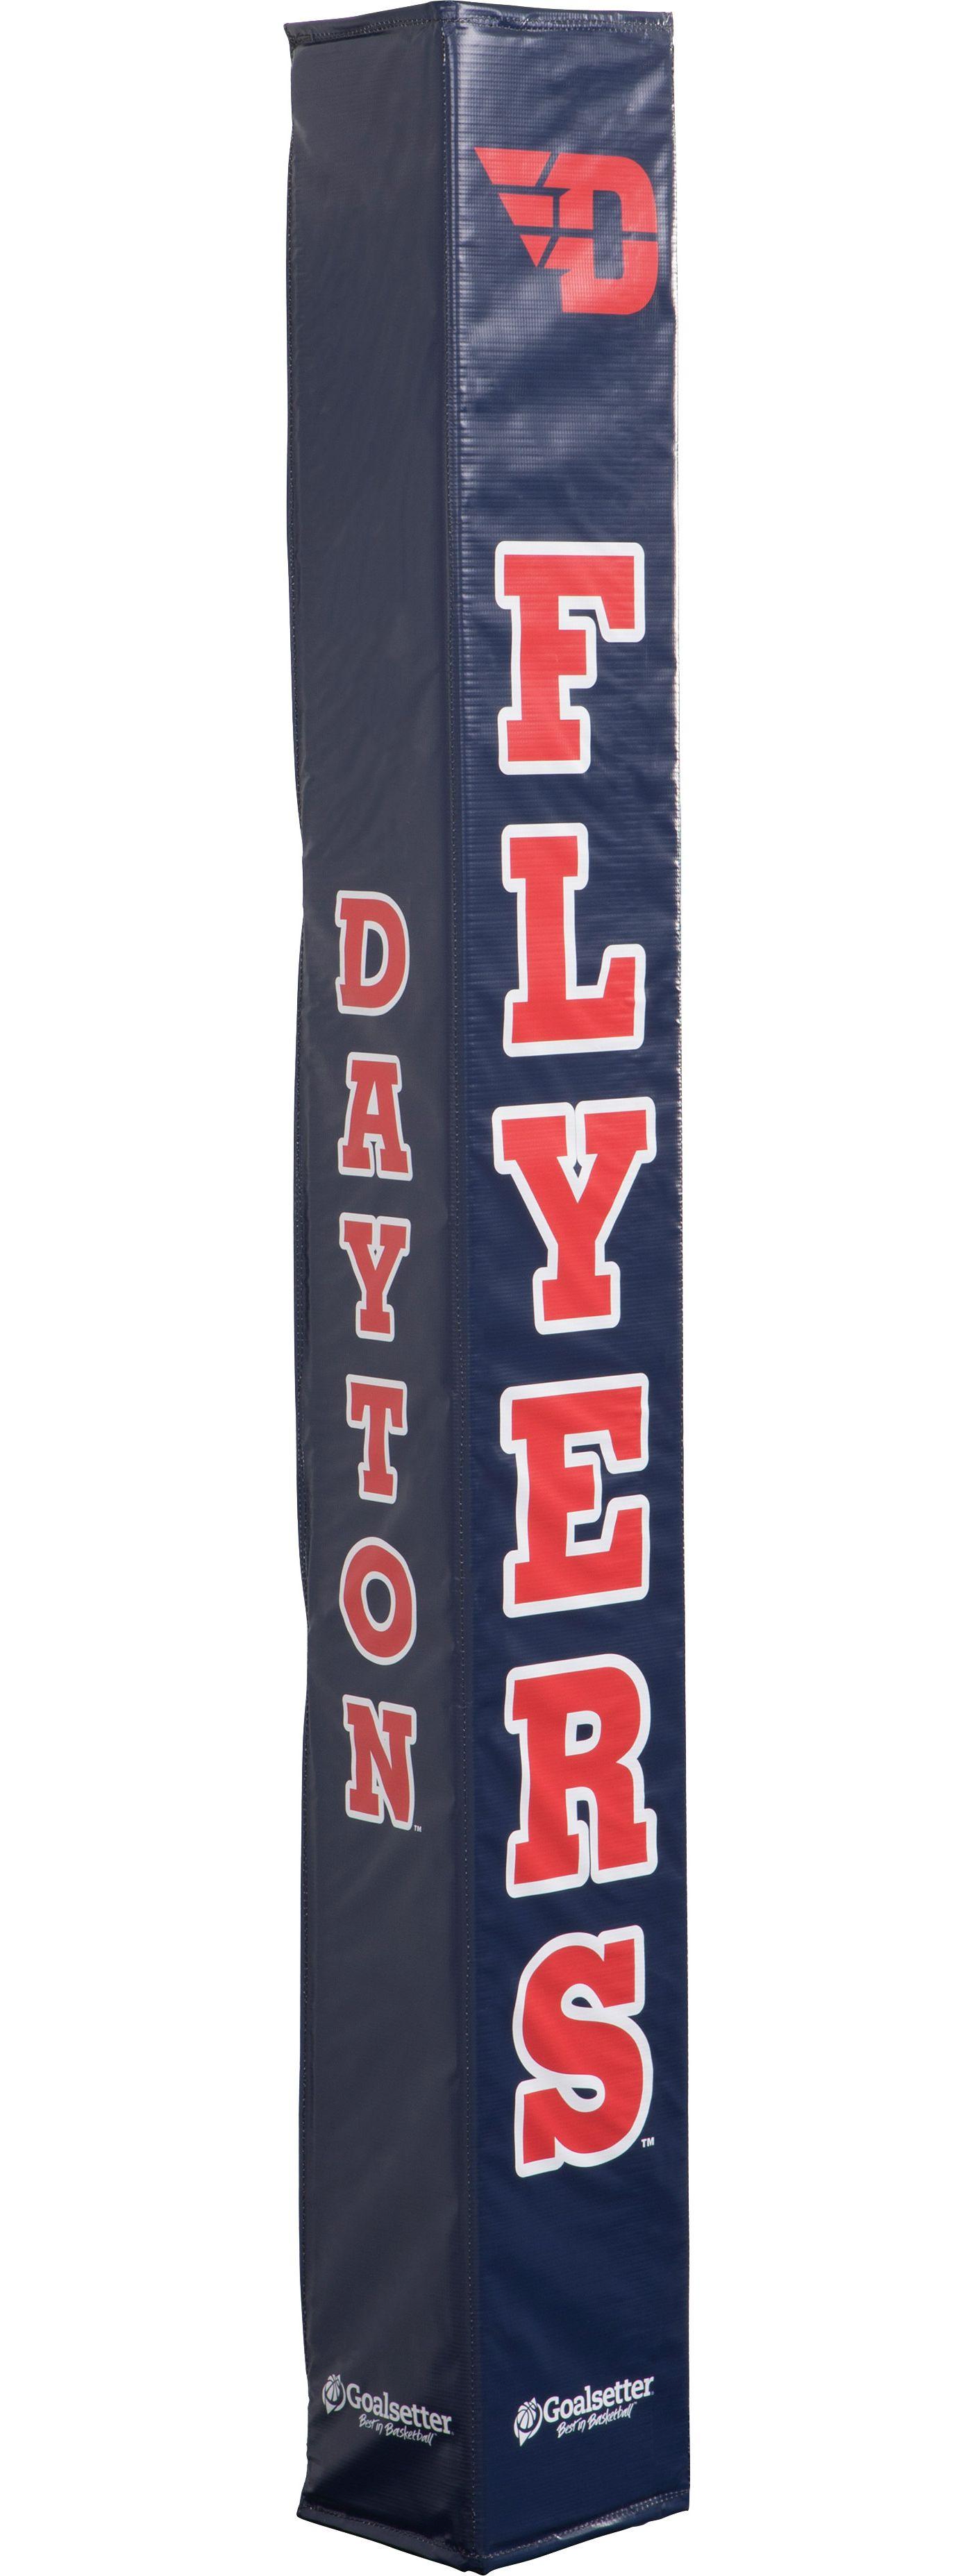 Goalsetter Dayton Flyers Basketball Pole Pad